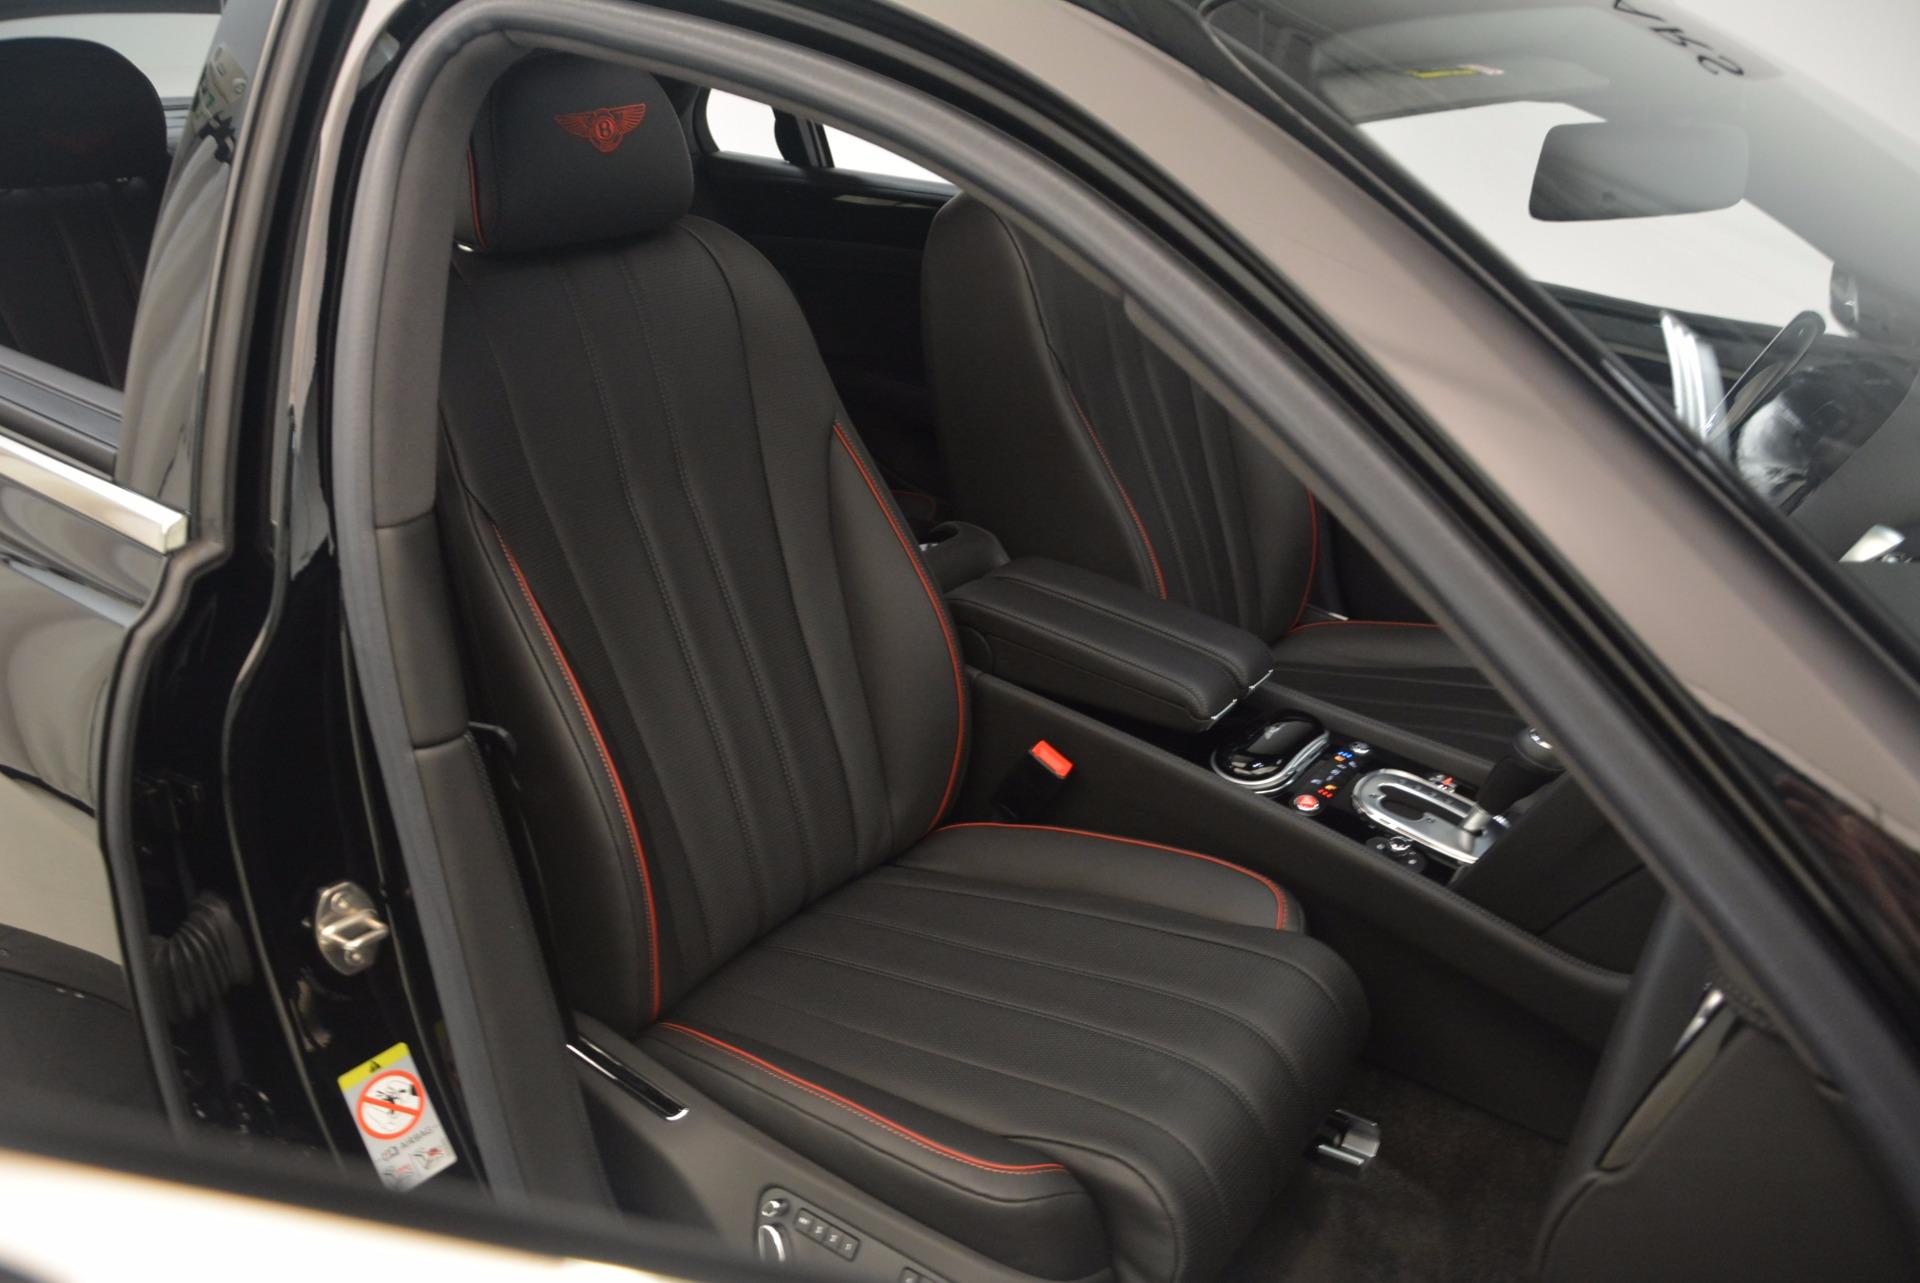 Used 2015 Bentley Flying Spur V8 For Sale In Westport, CT 1199_p43